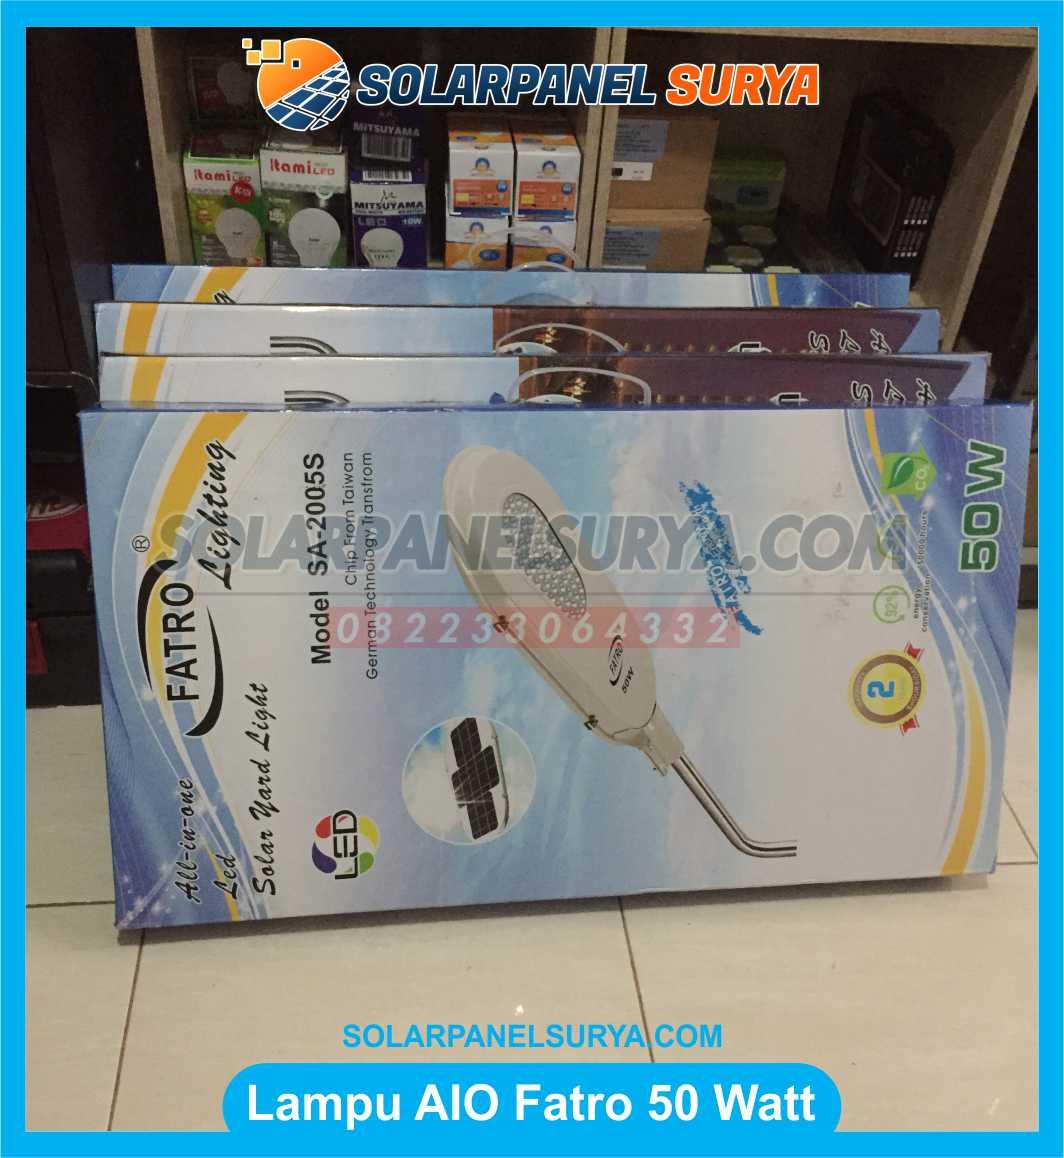 jual Lampu Jalan Fatro Solarcell 50W